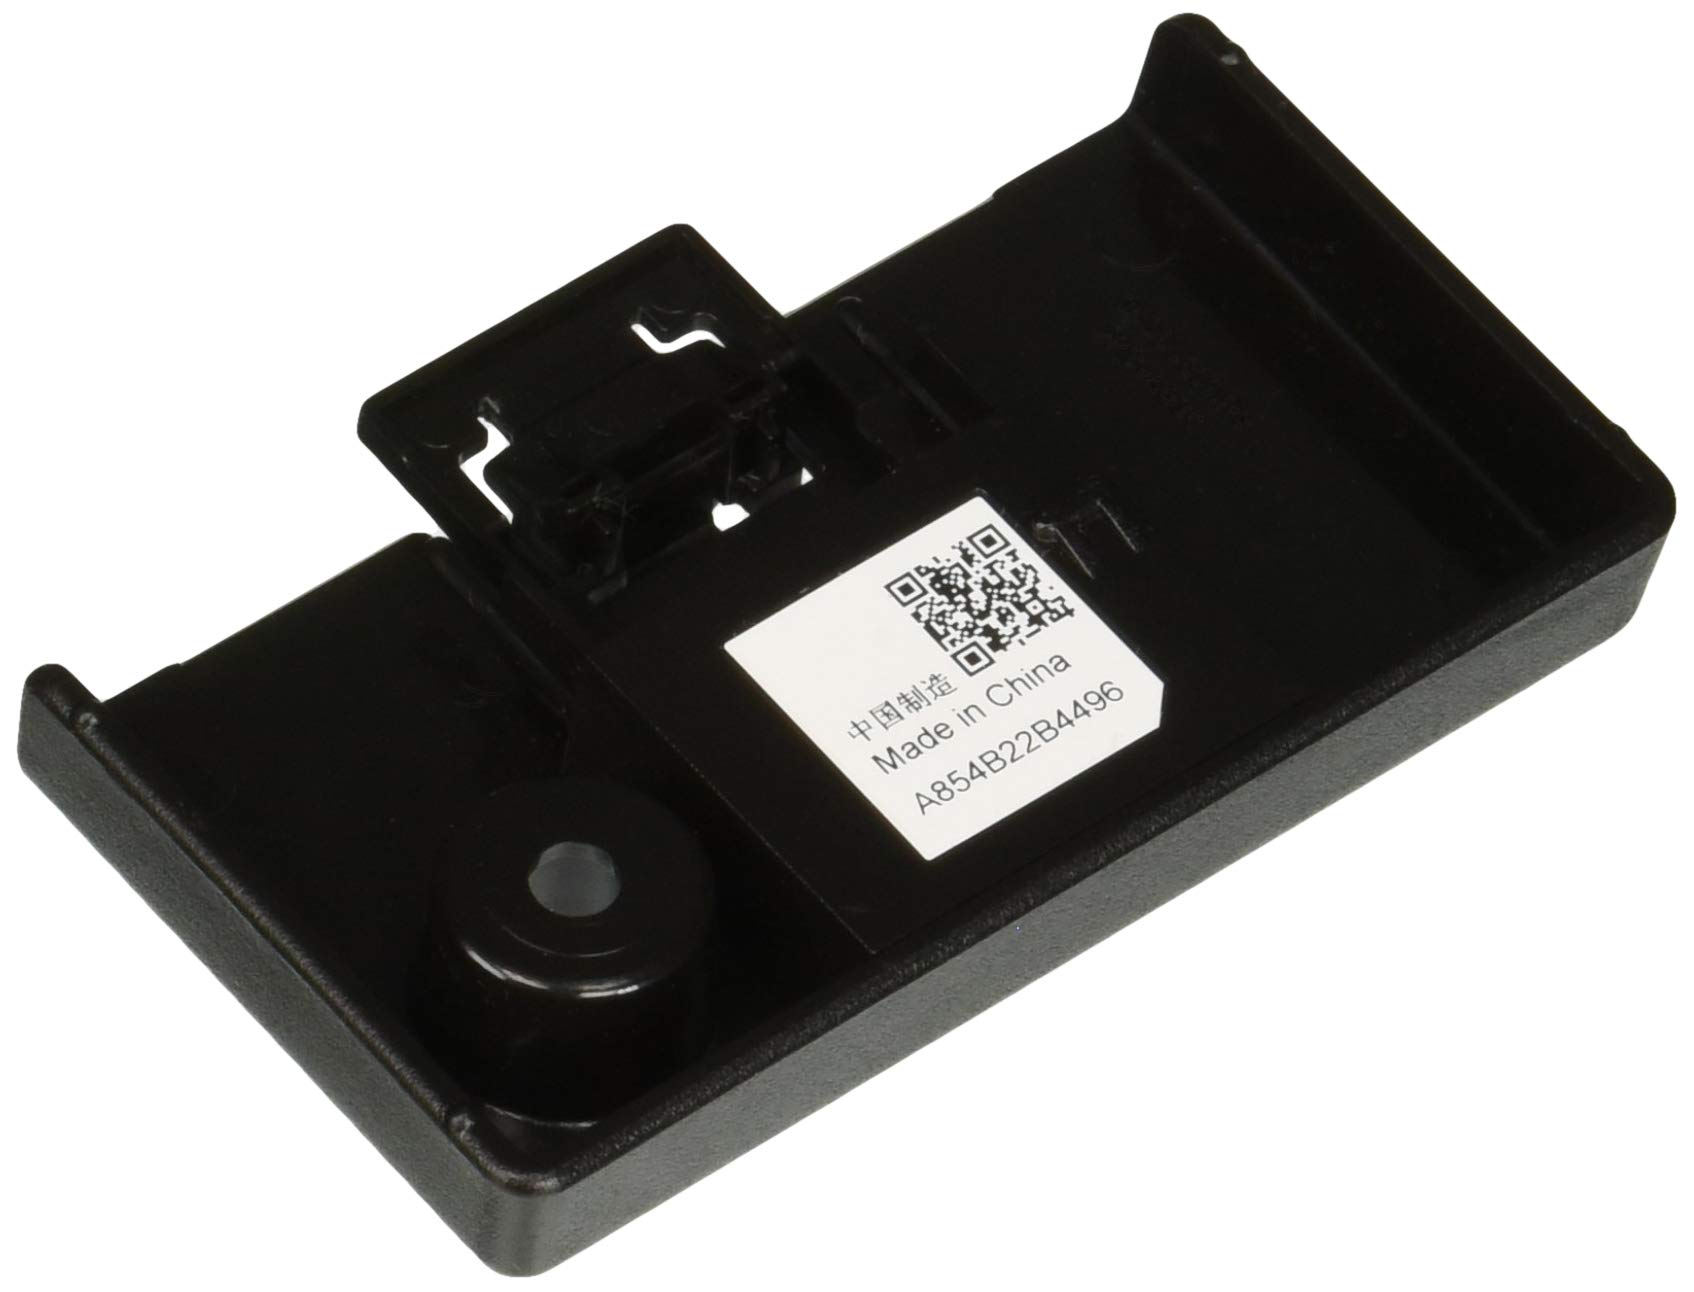 Panasonic N5HZZ0000122 Bluetooth - Dongle - Adapter by Panasonic